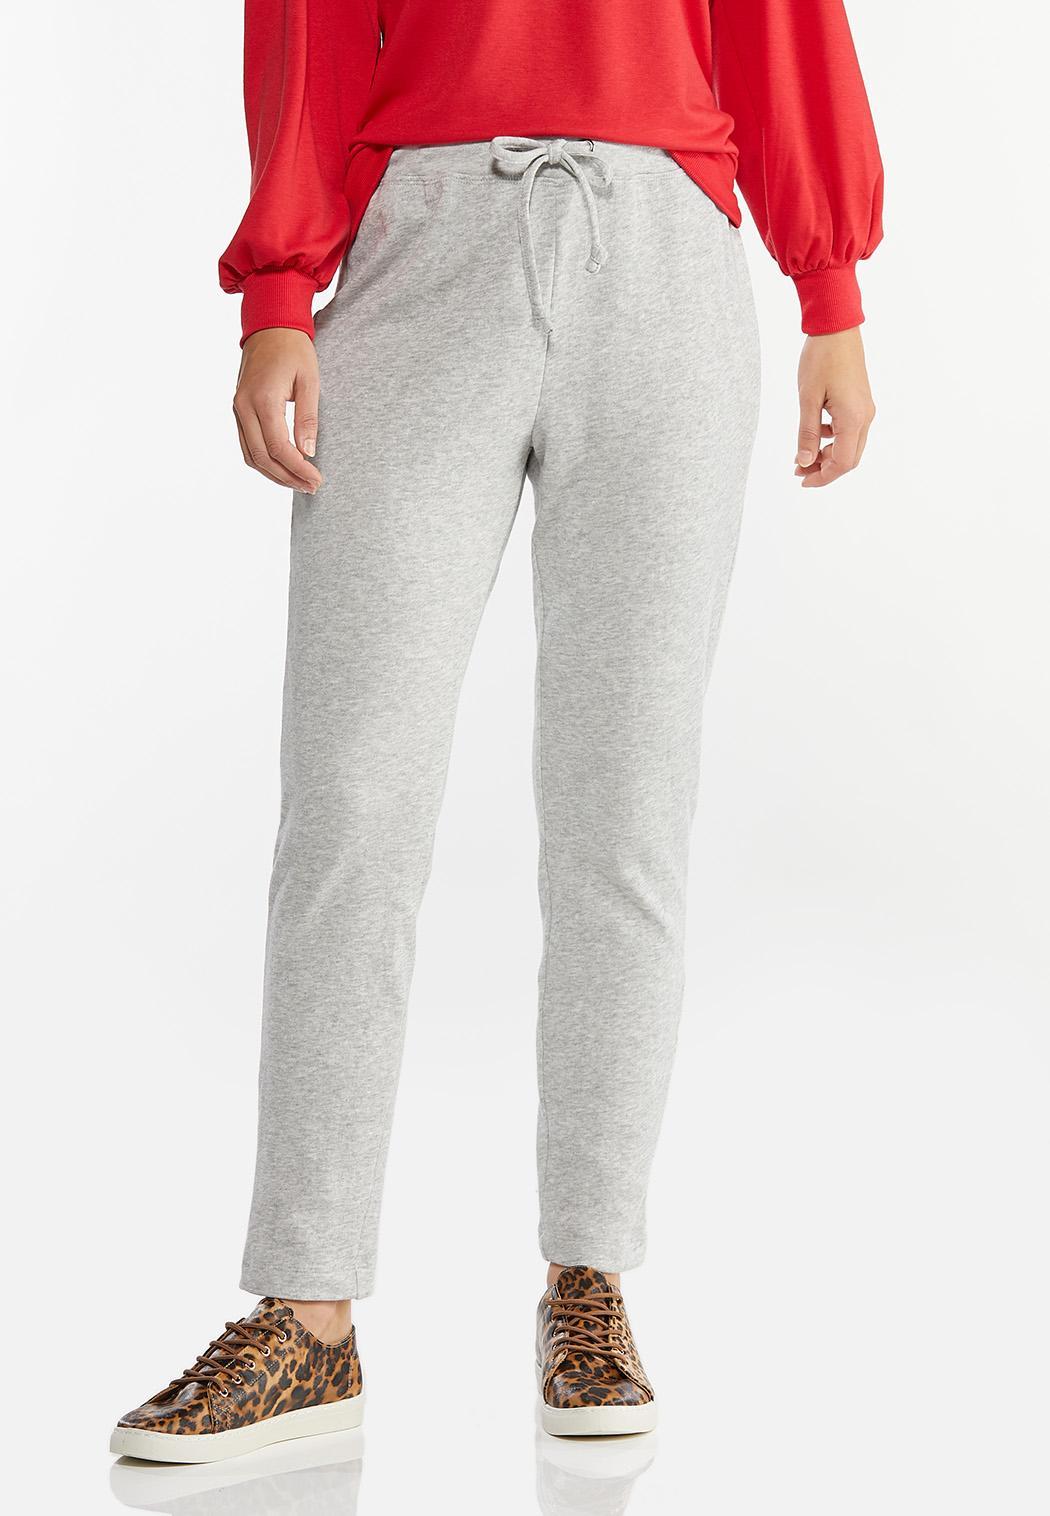 Gray Athleisure Pants